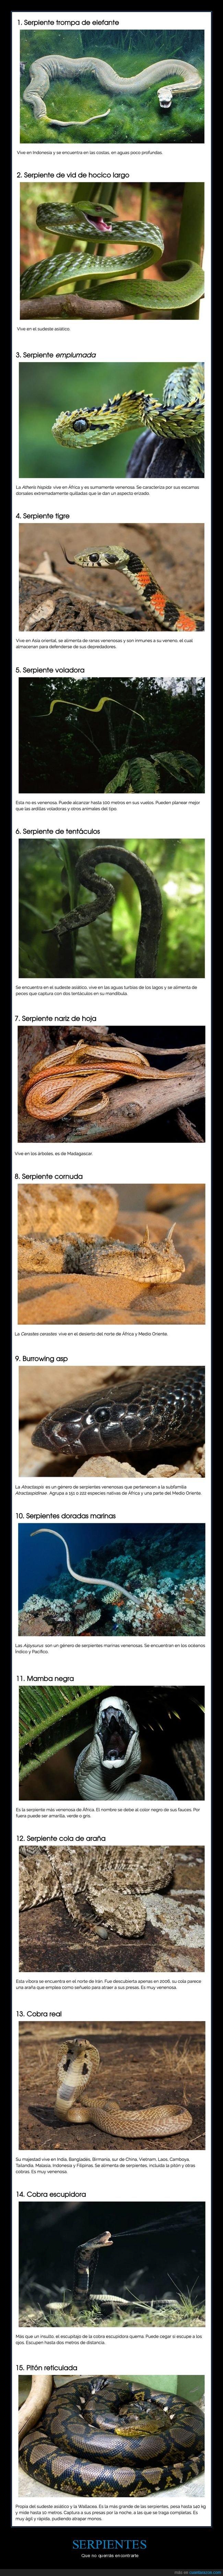 curiosidades,peligrosas,serpientes